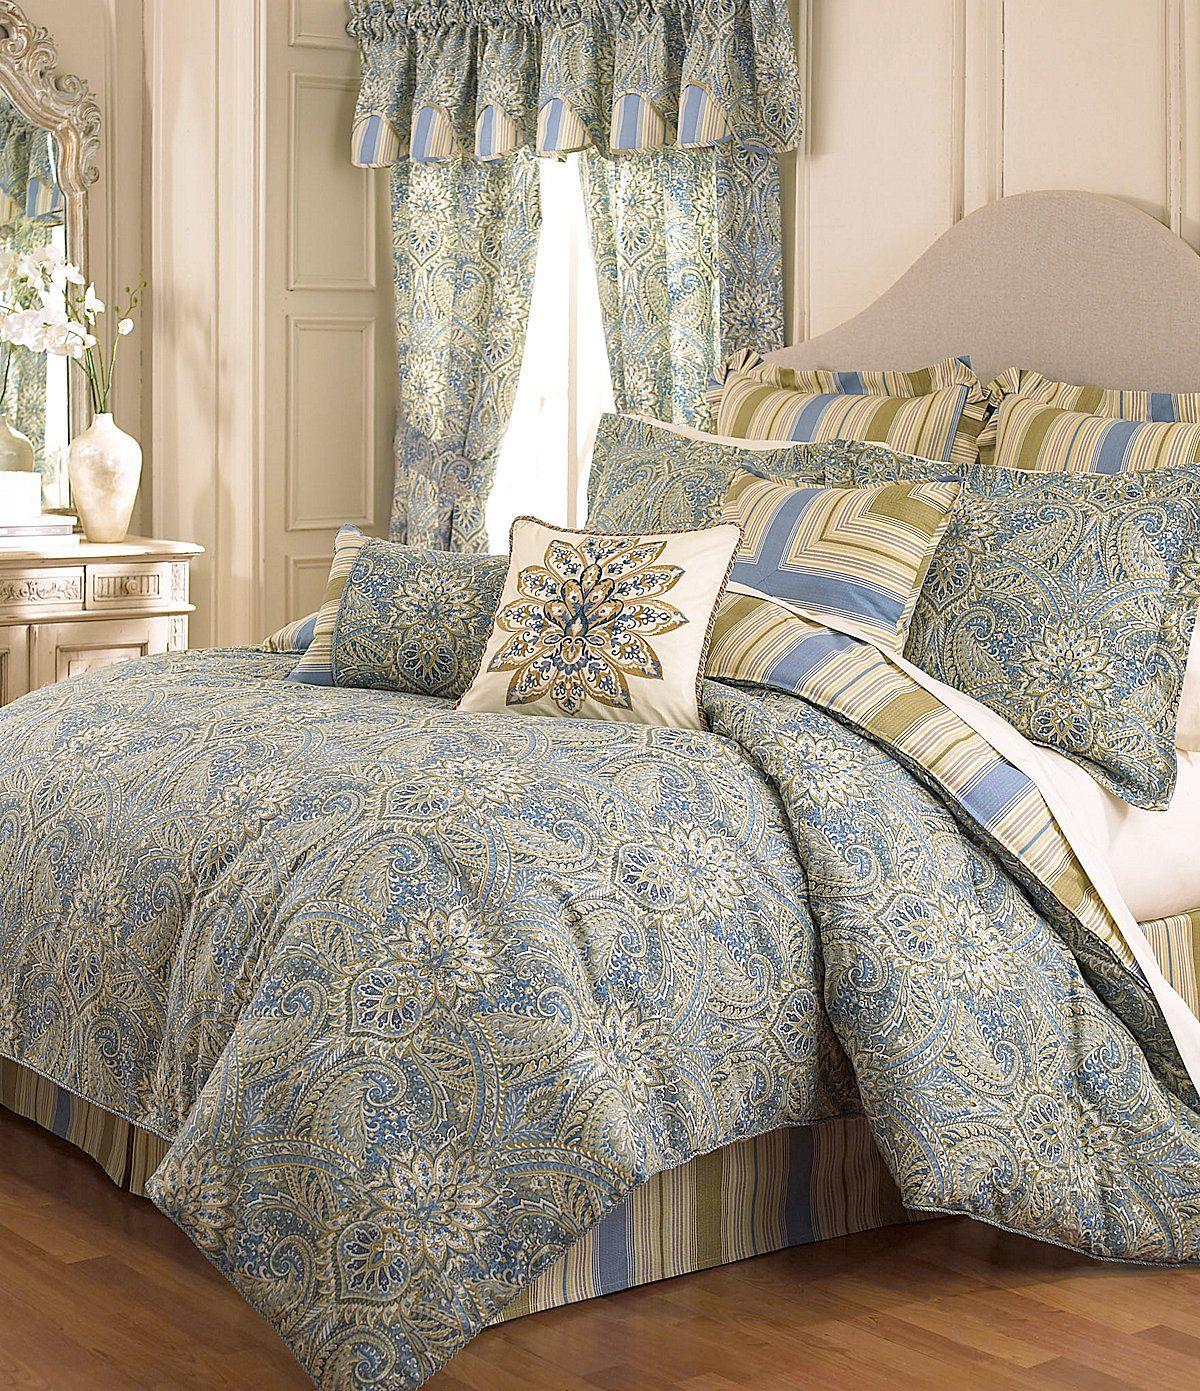 Waverly Swept Away Bedding Collection Dillards Com